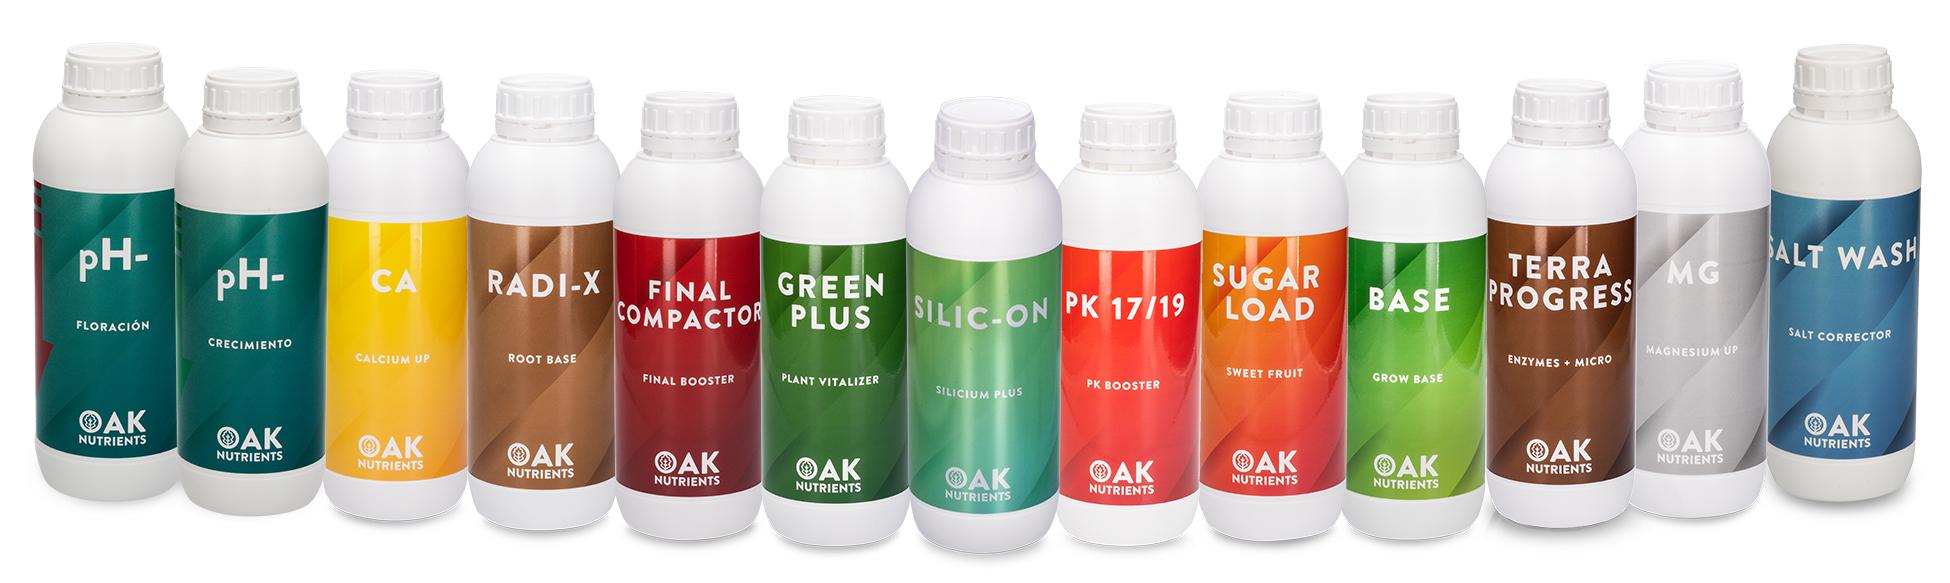 Gama de fertilizantes OAK Nutrients